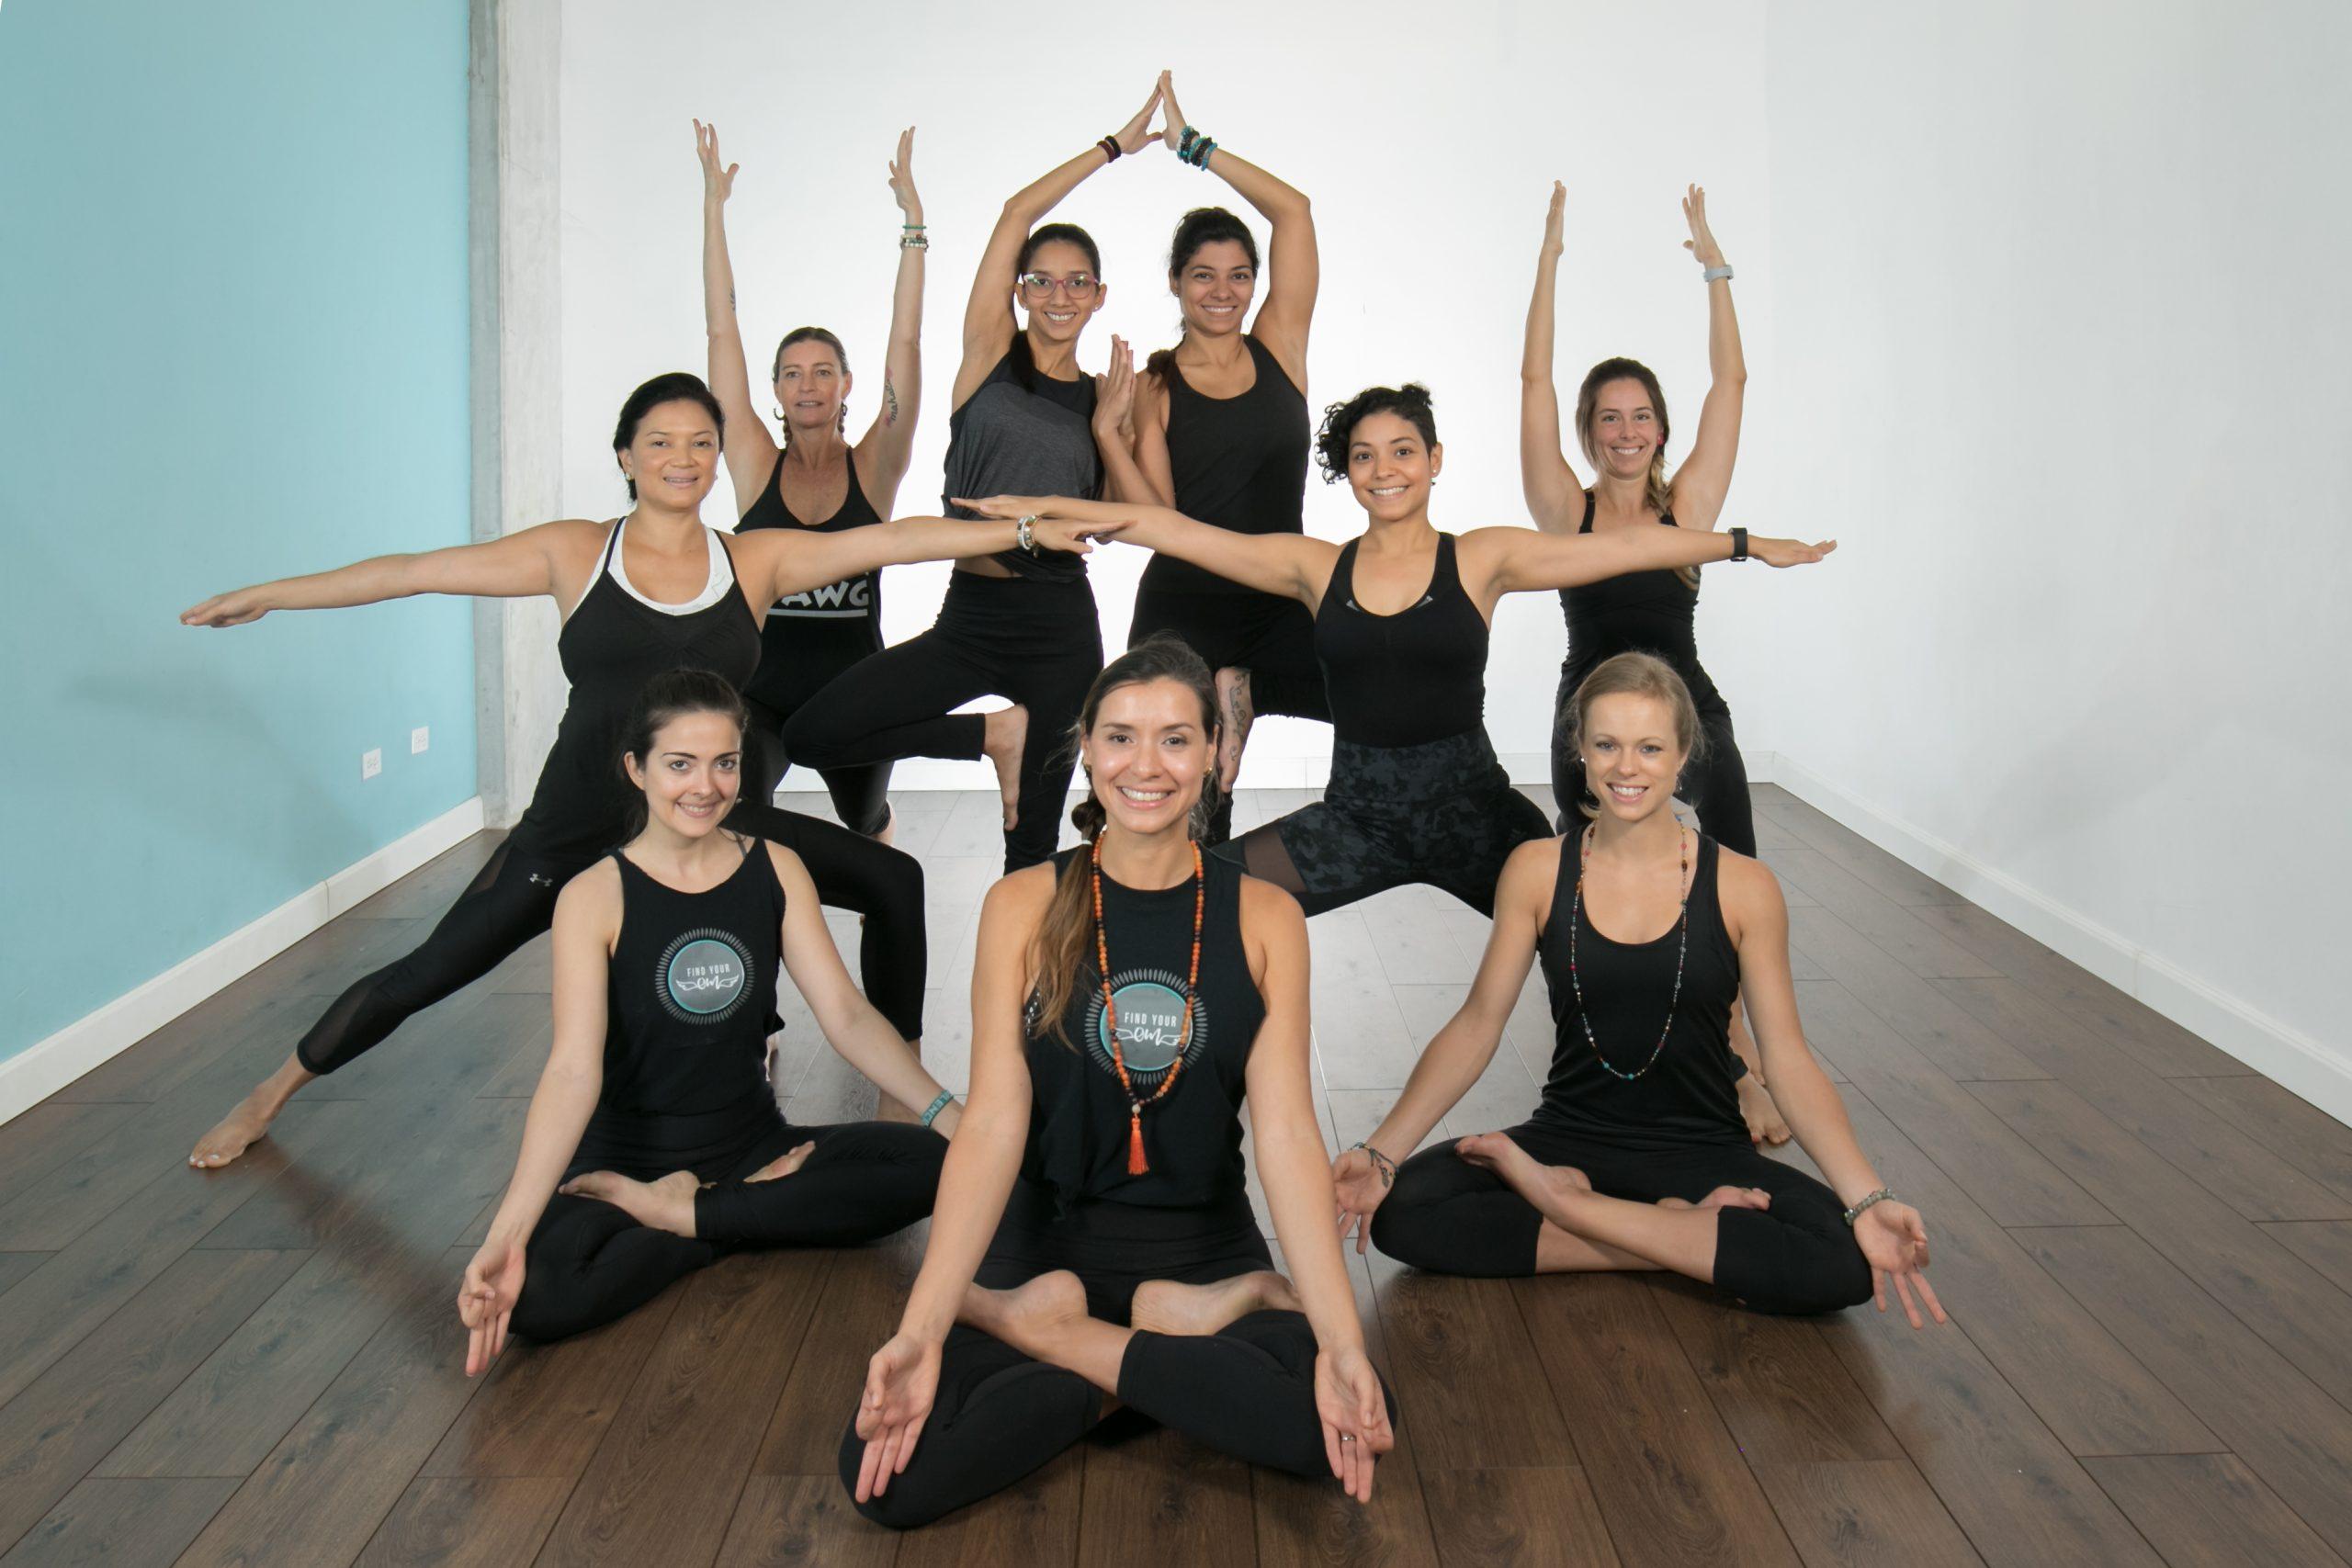 Yoga Panama - 9M7A1912grupal - Find your om